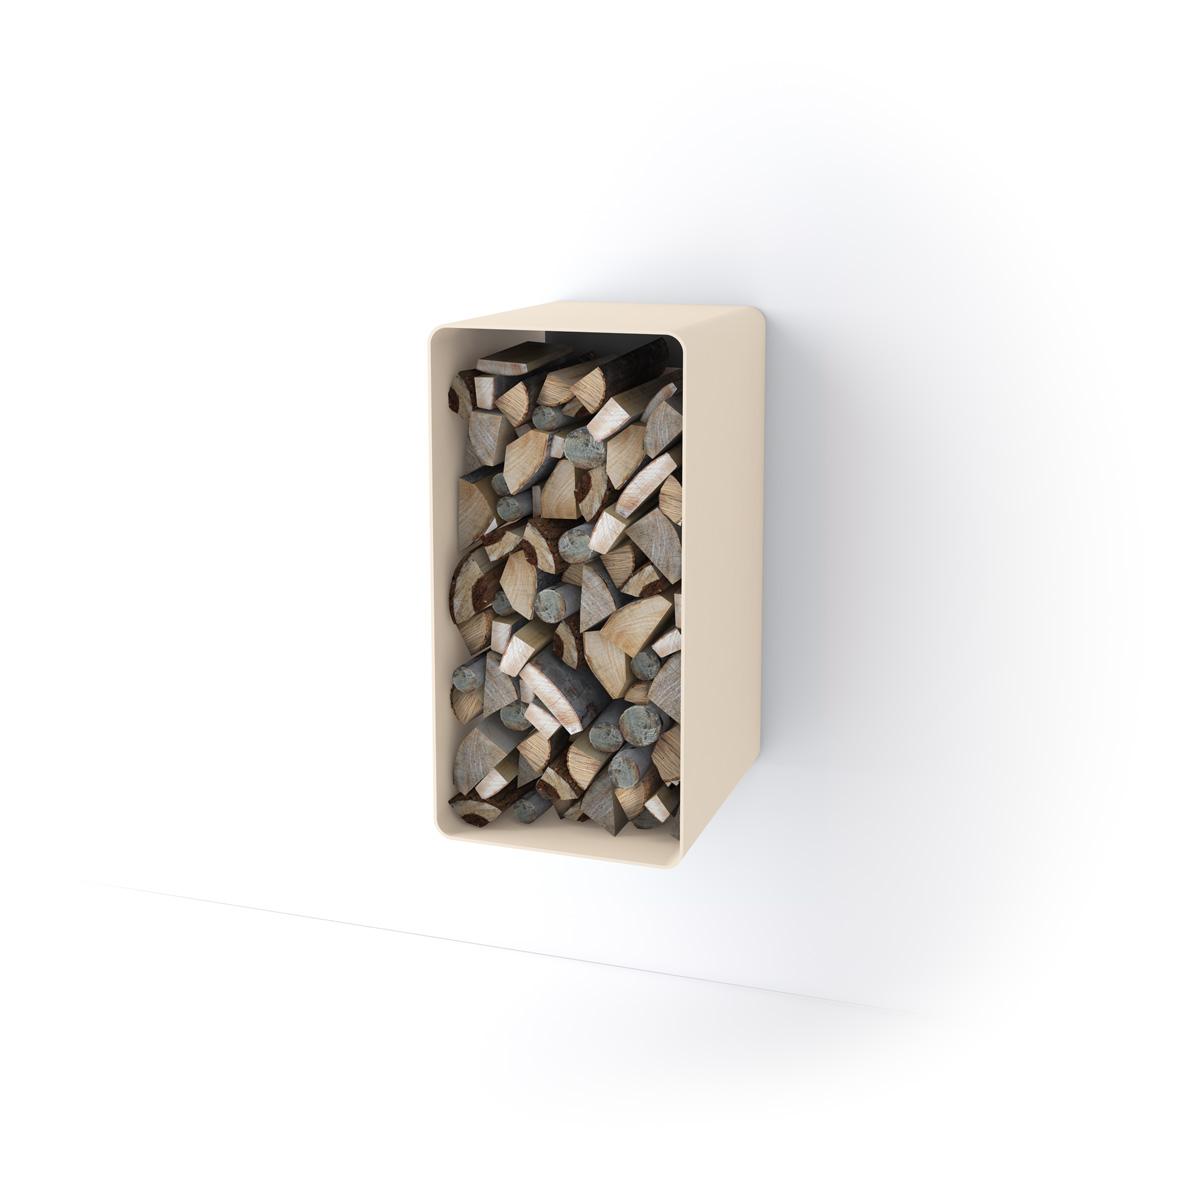 Stojan na dřevo FD4 krém